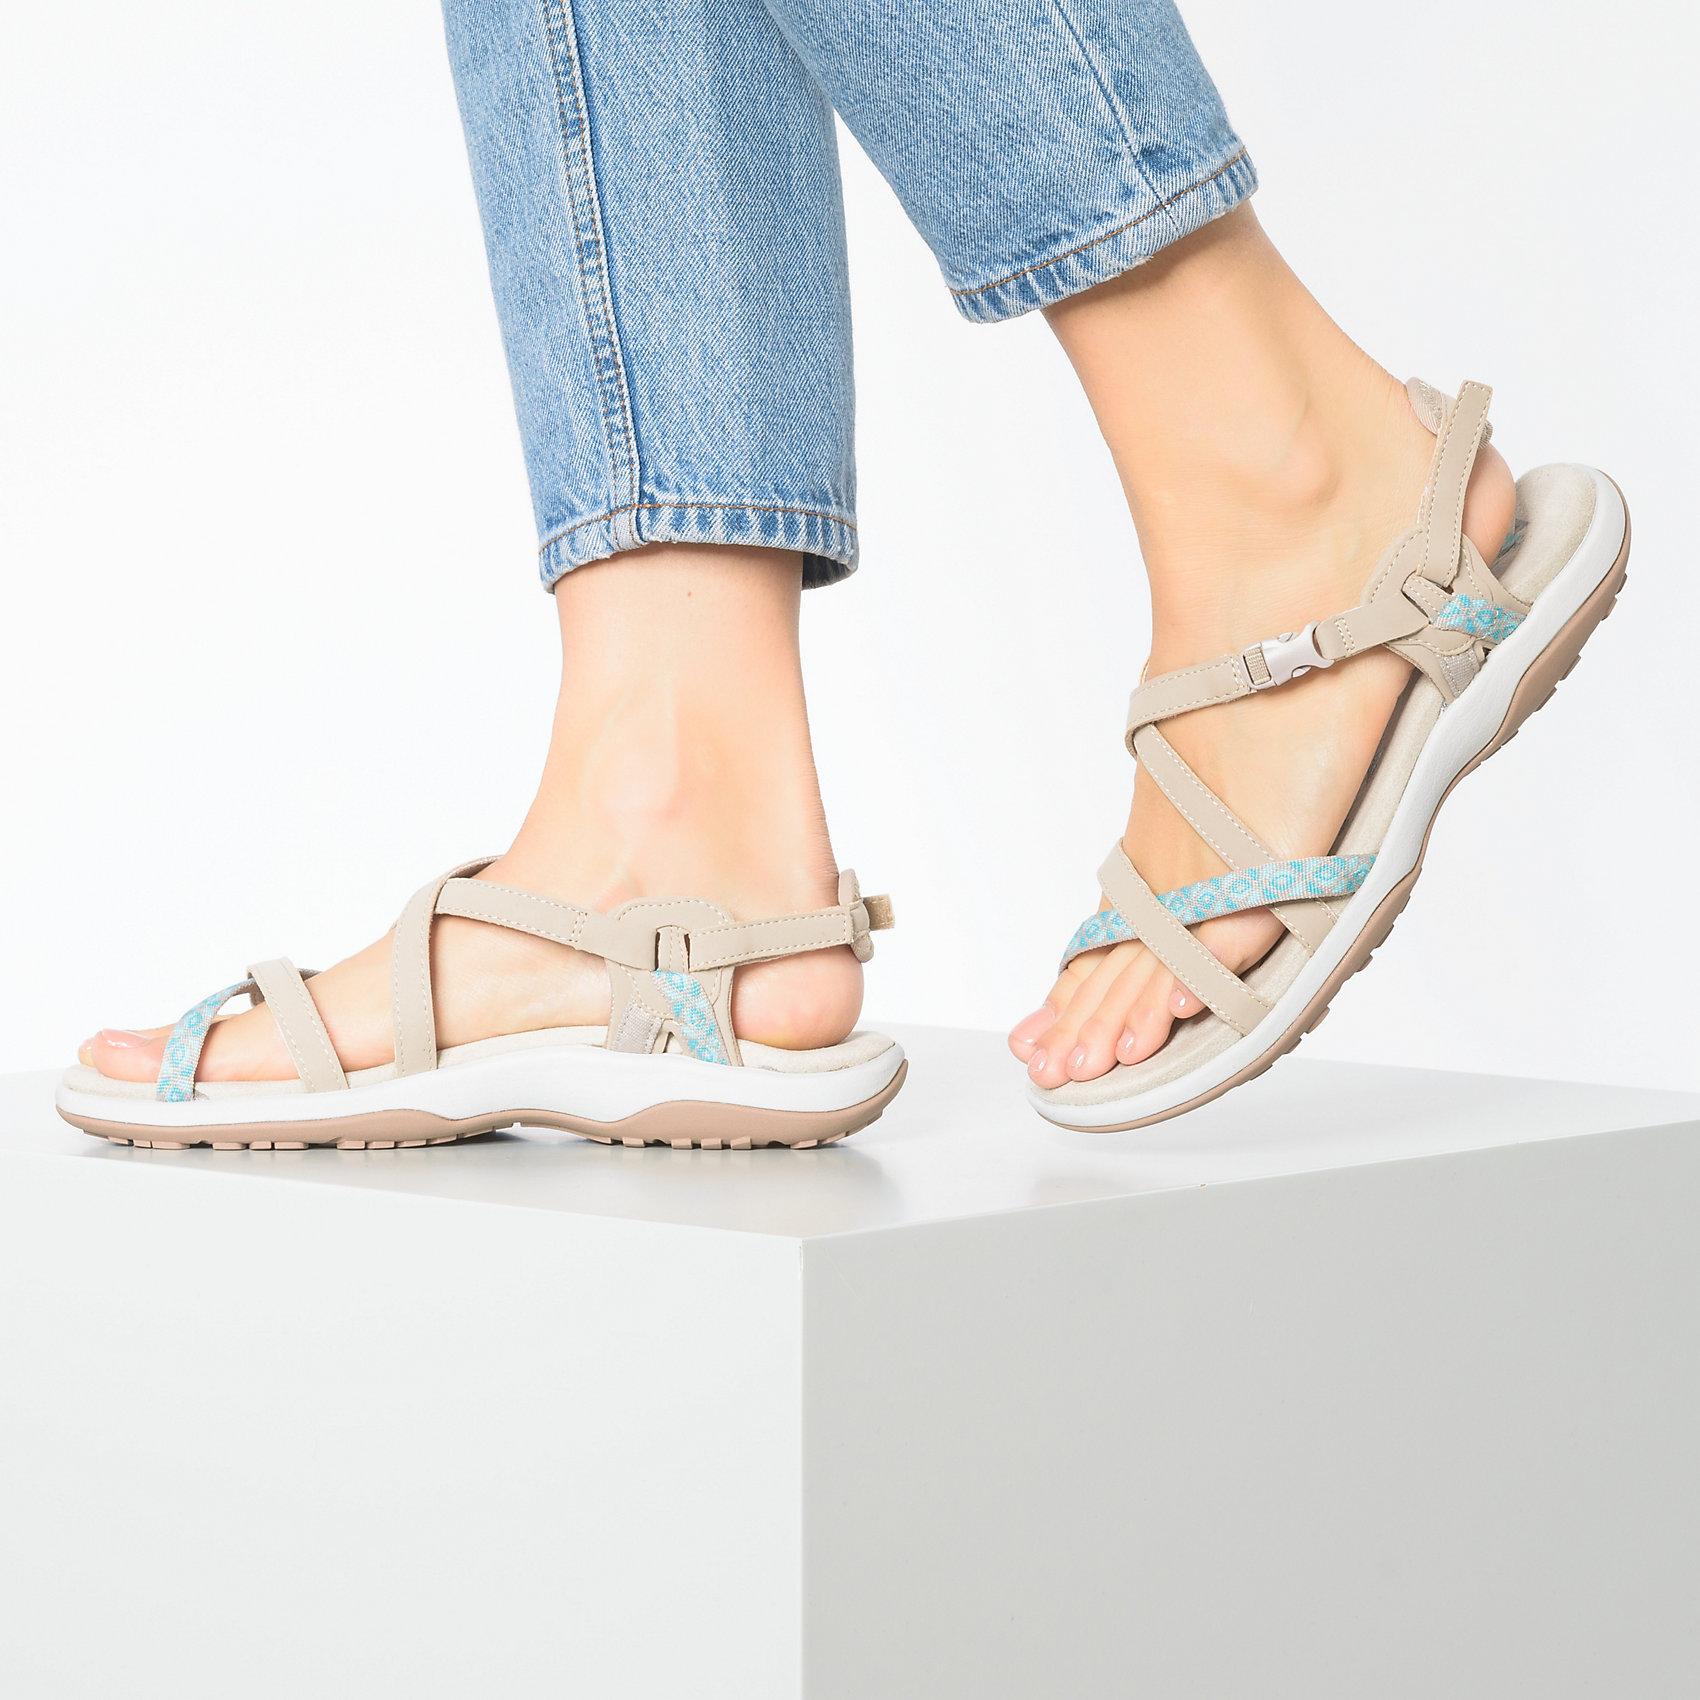 Skechers Women's Reggae Slim Vacay Sandals